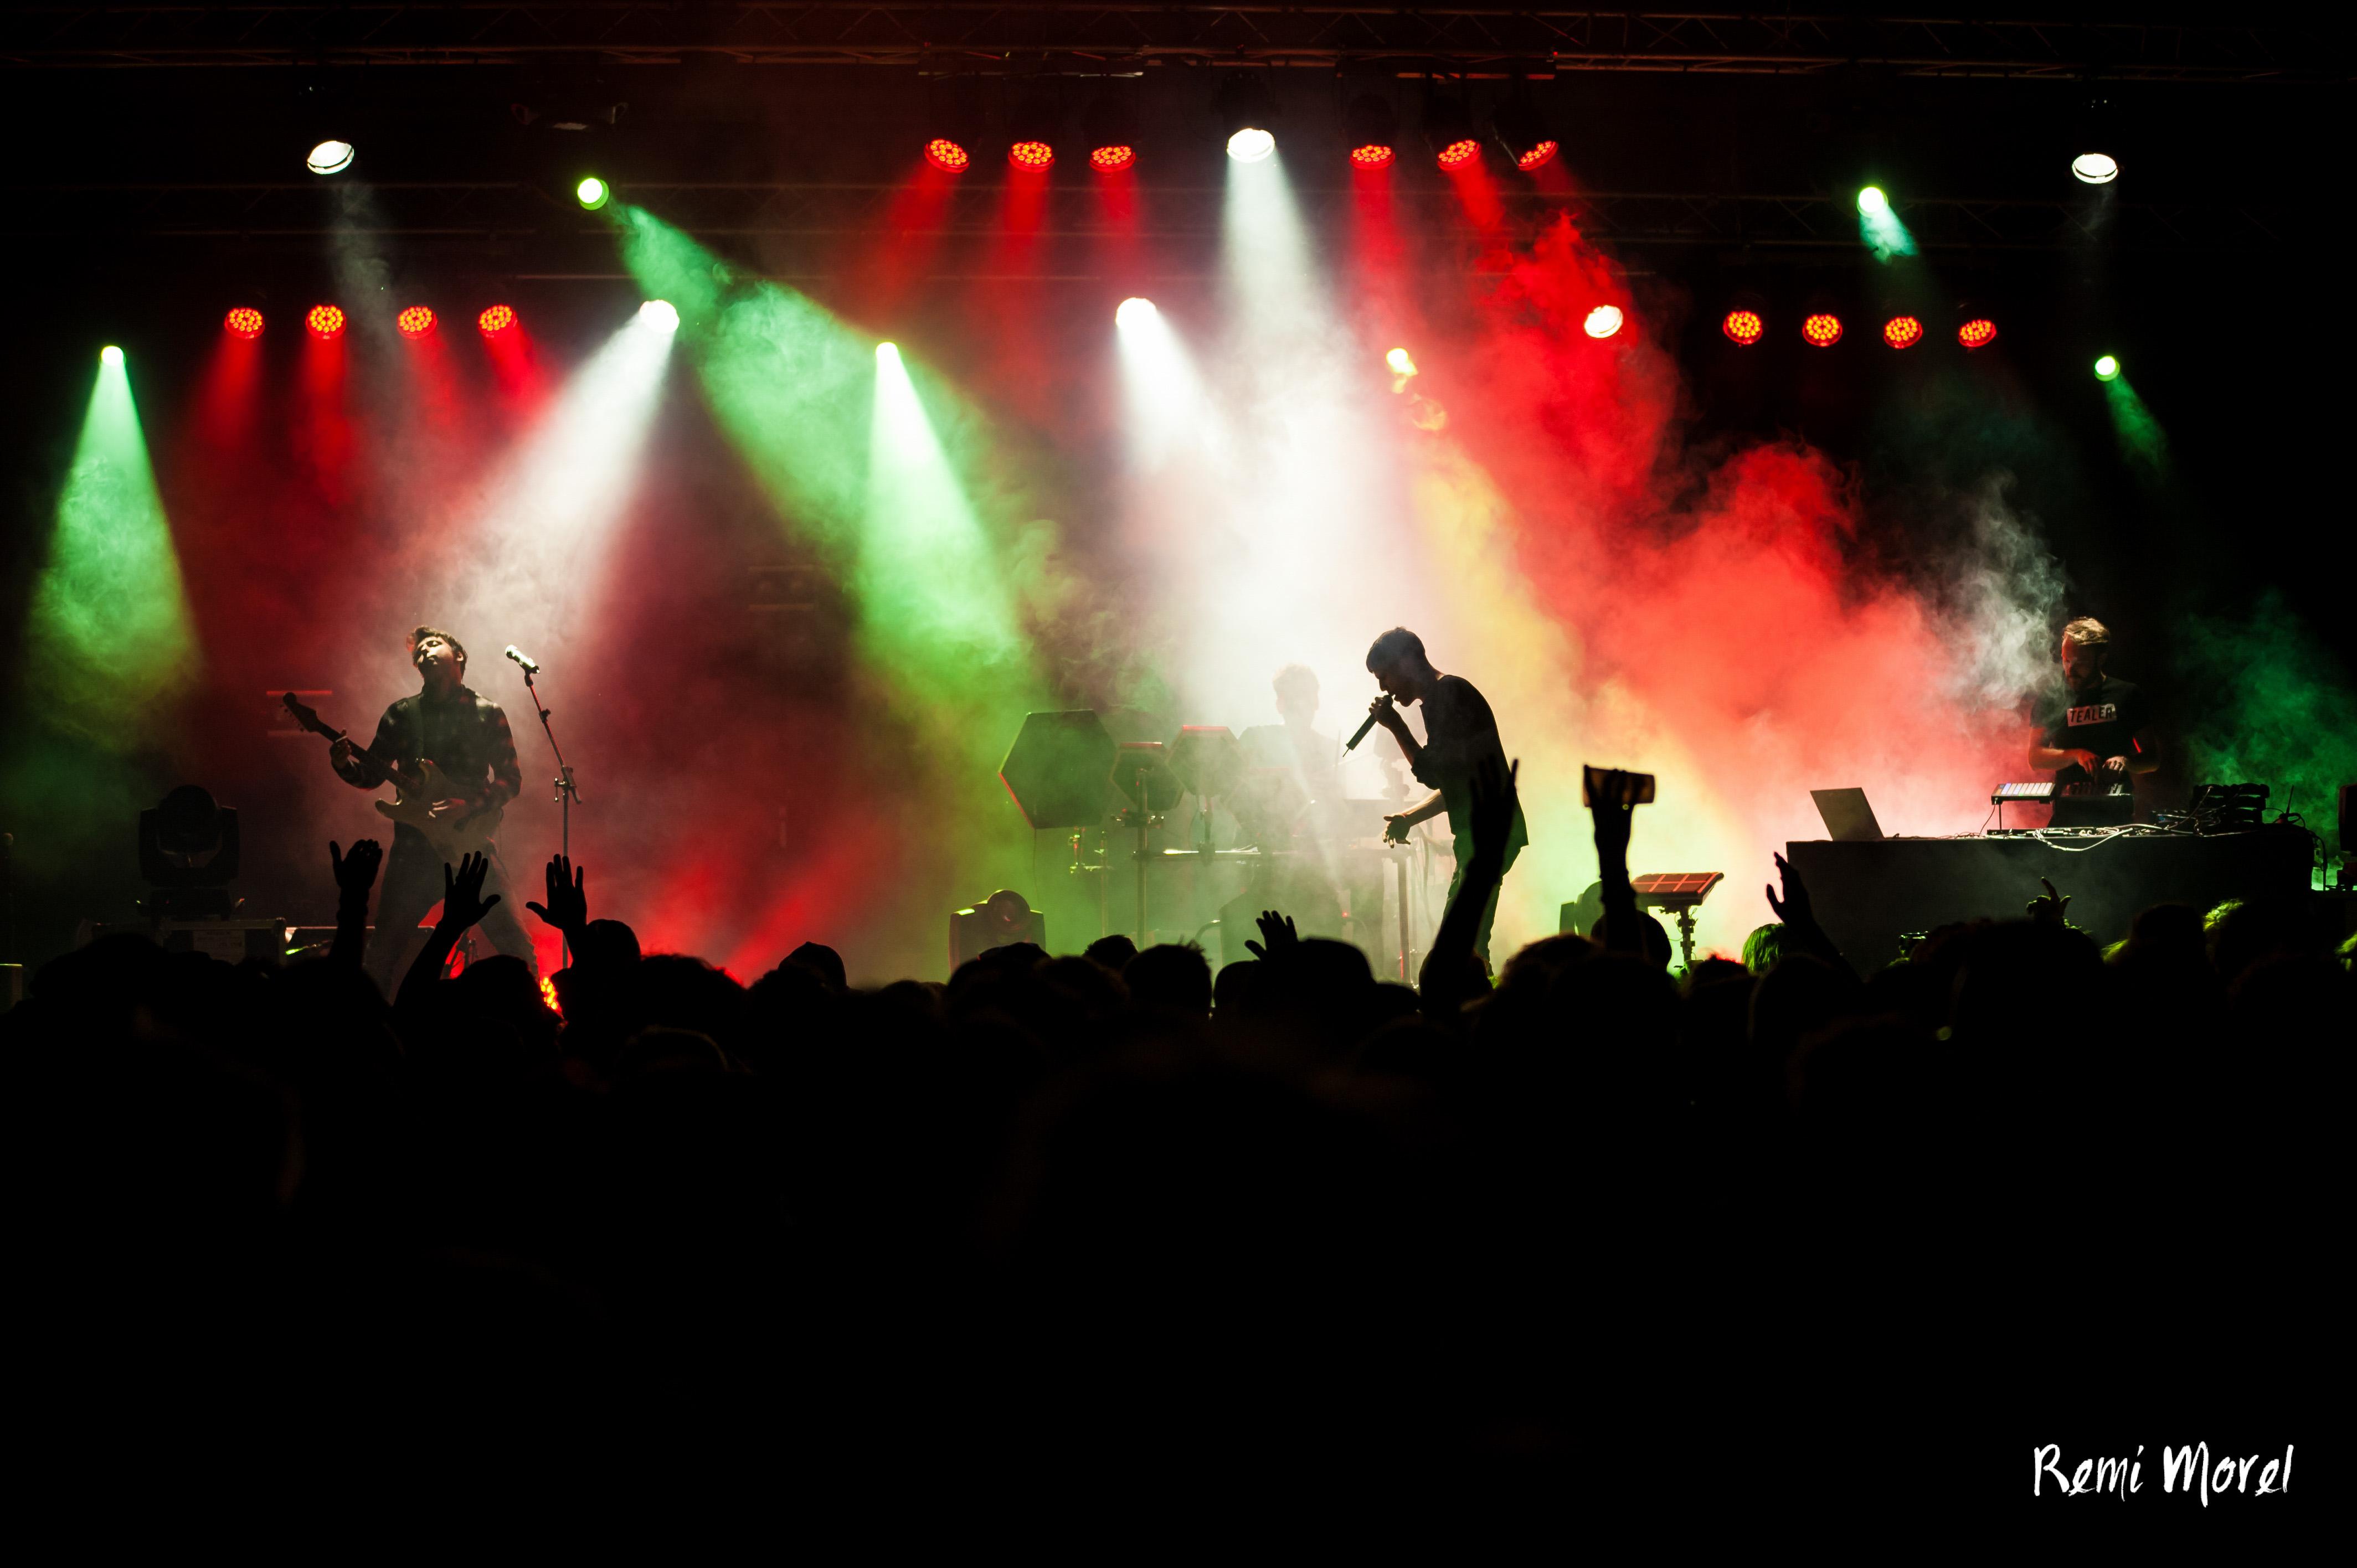 remi-morel-tradin-festival-biga-ranx-25